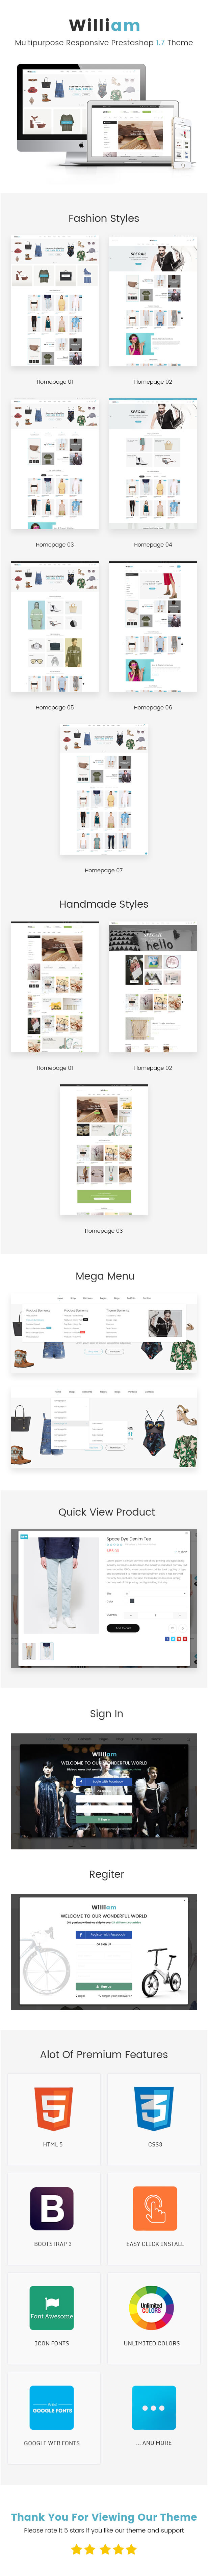 William - Responsive eCommerce Prestashop 1.7 Template - 2